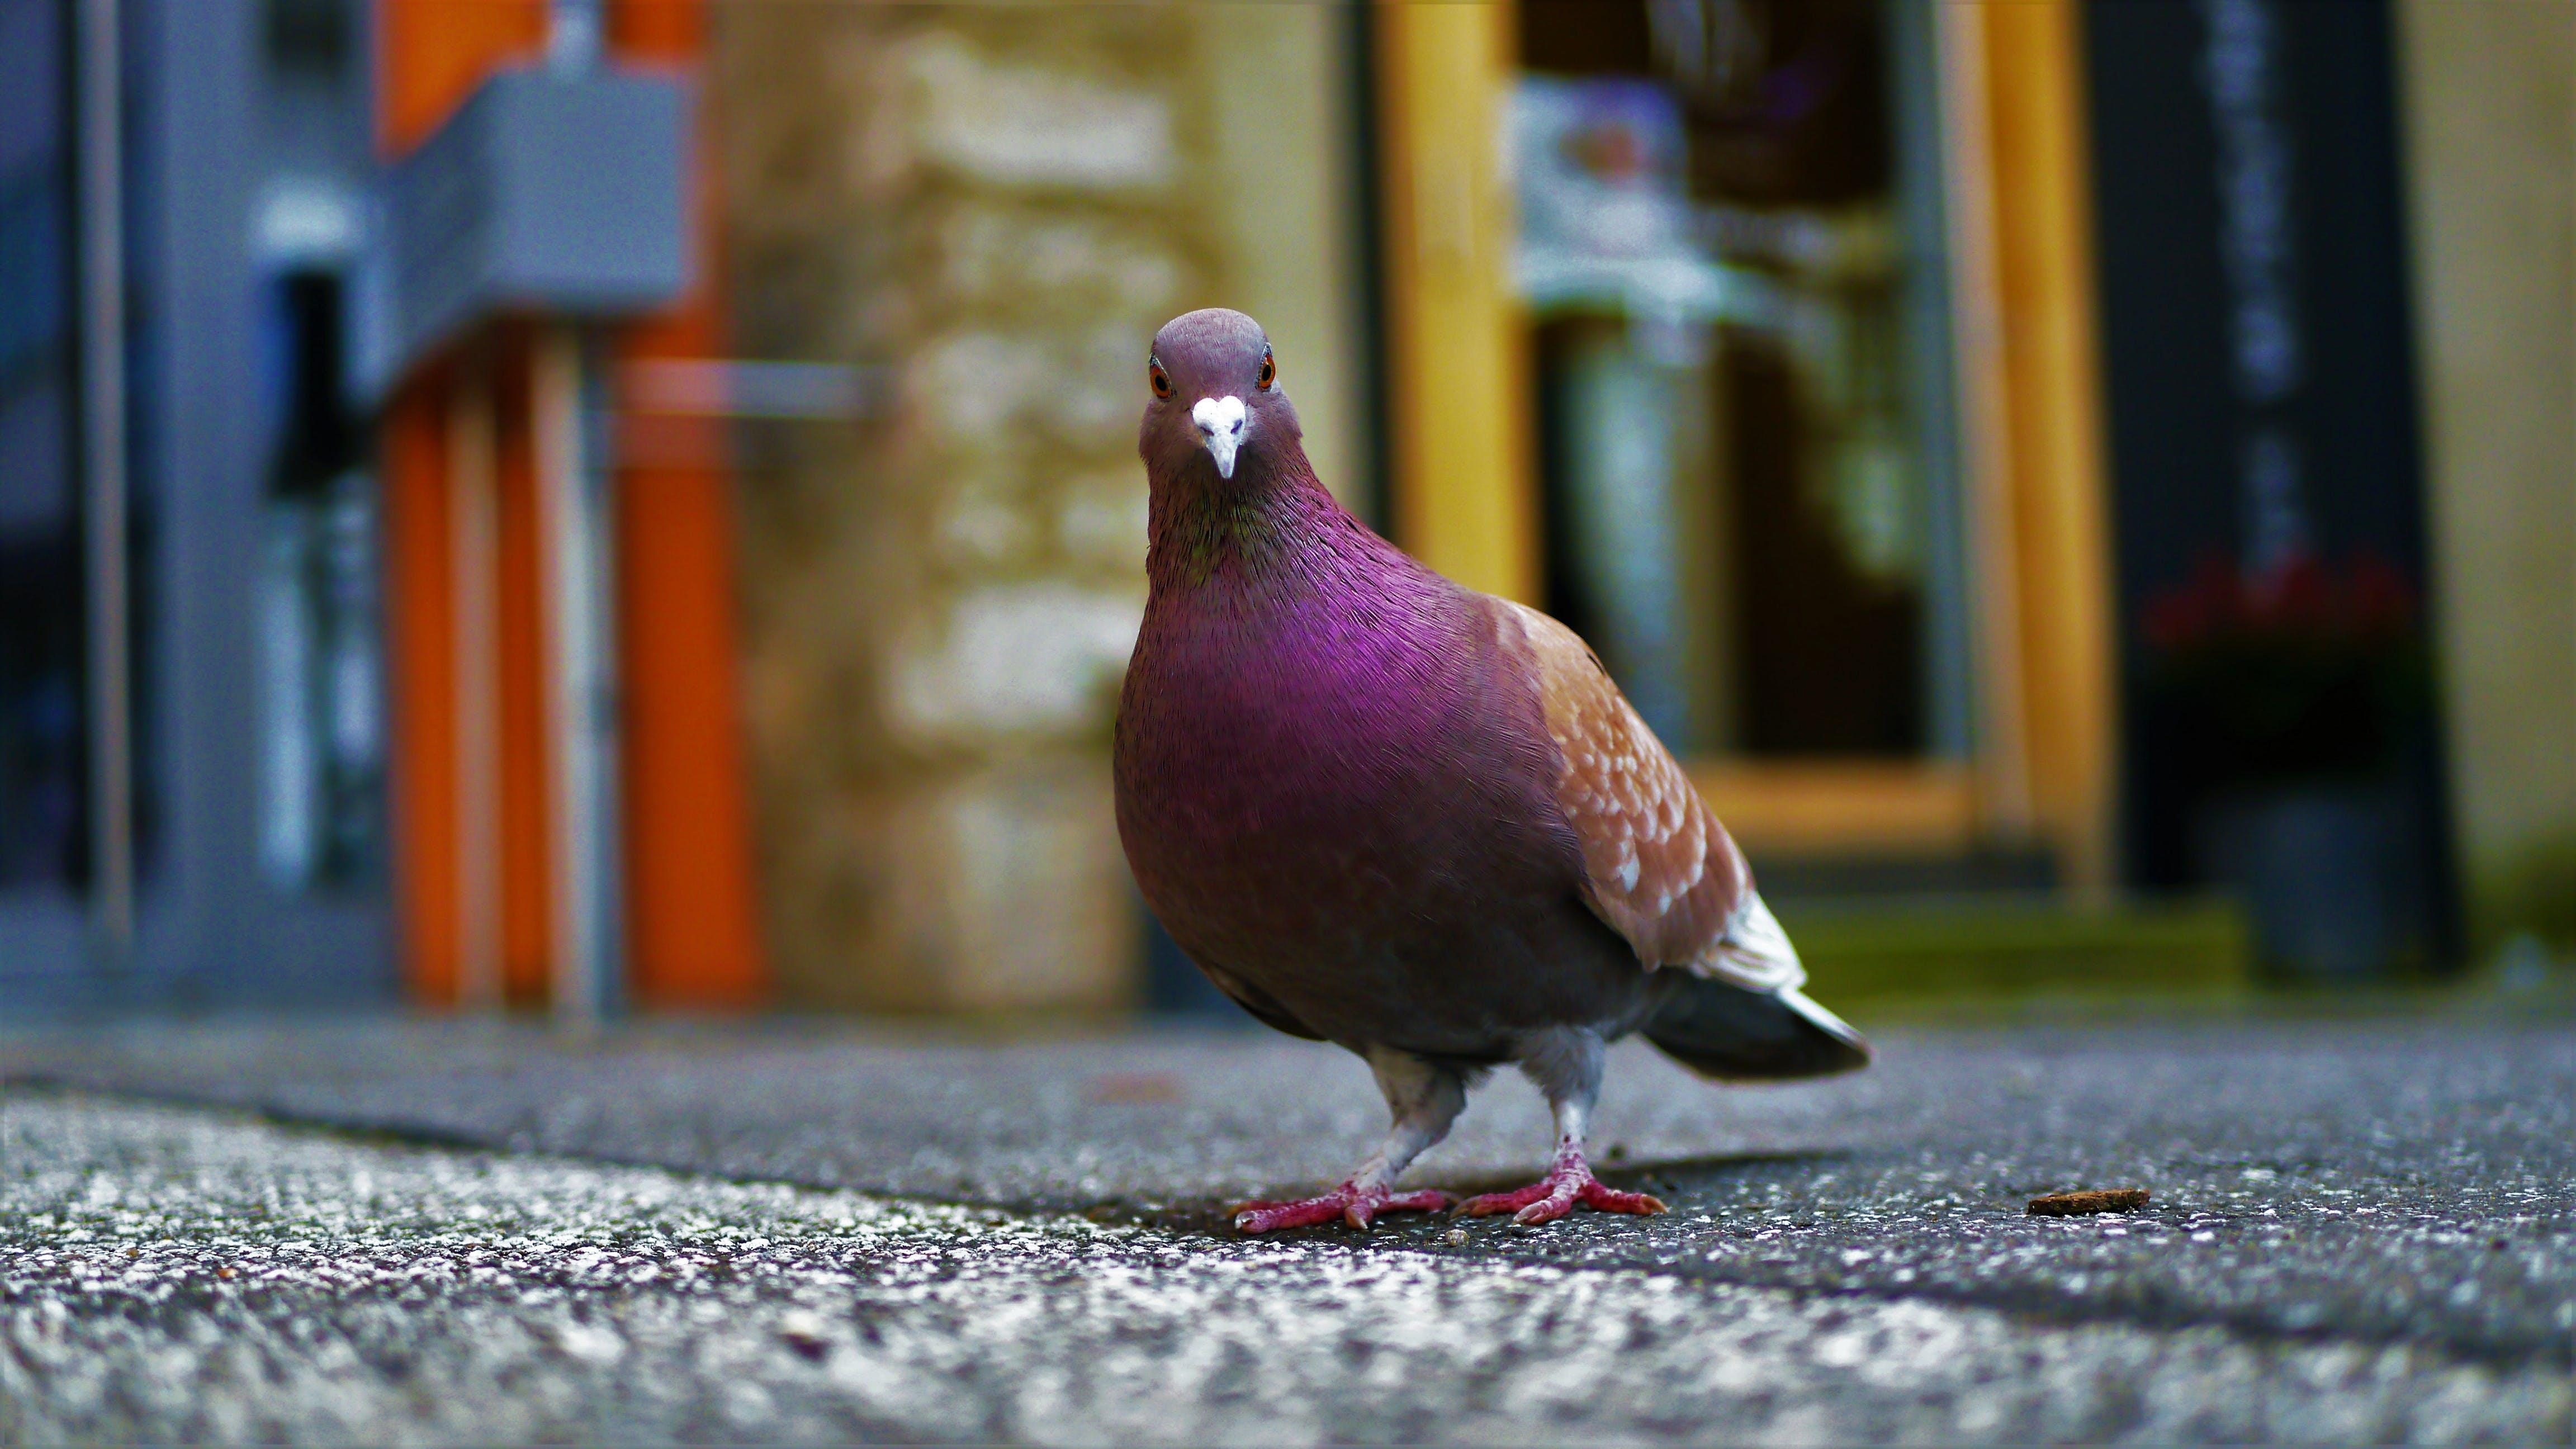 Purple Pigeon Standing on Black Concrete Surface